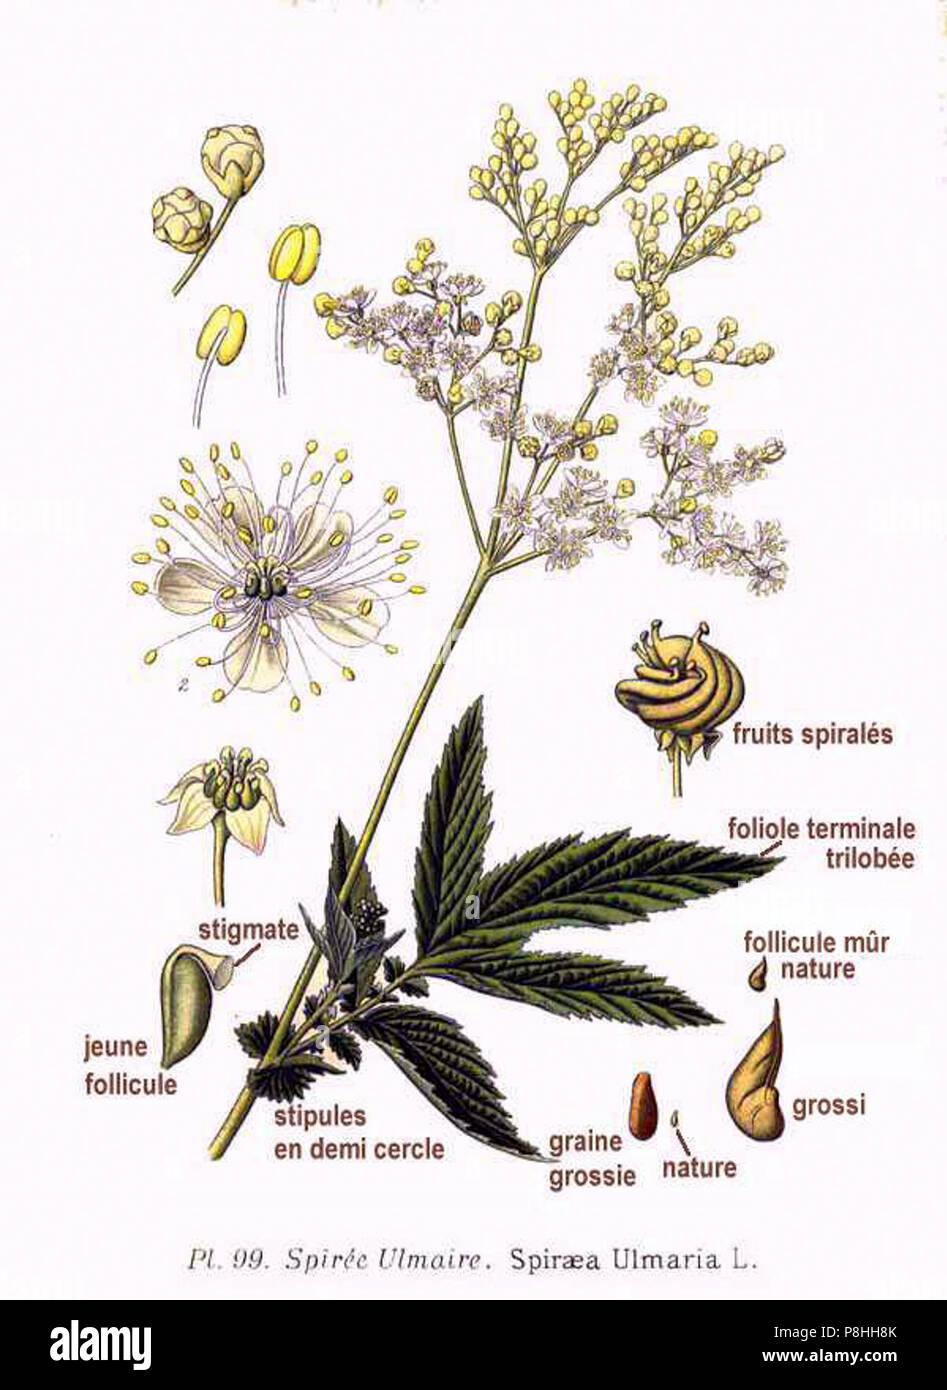 500 graines Meadowsweet salicifolia Spiraea salicifolia